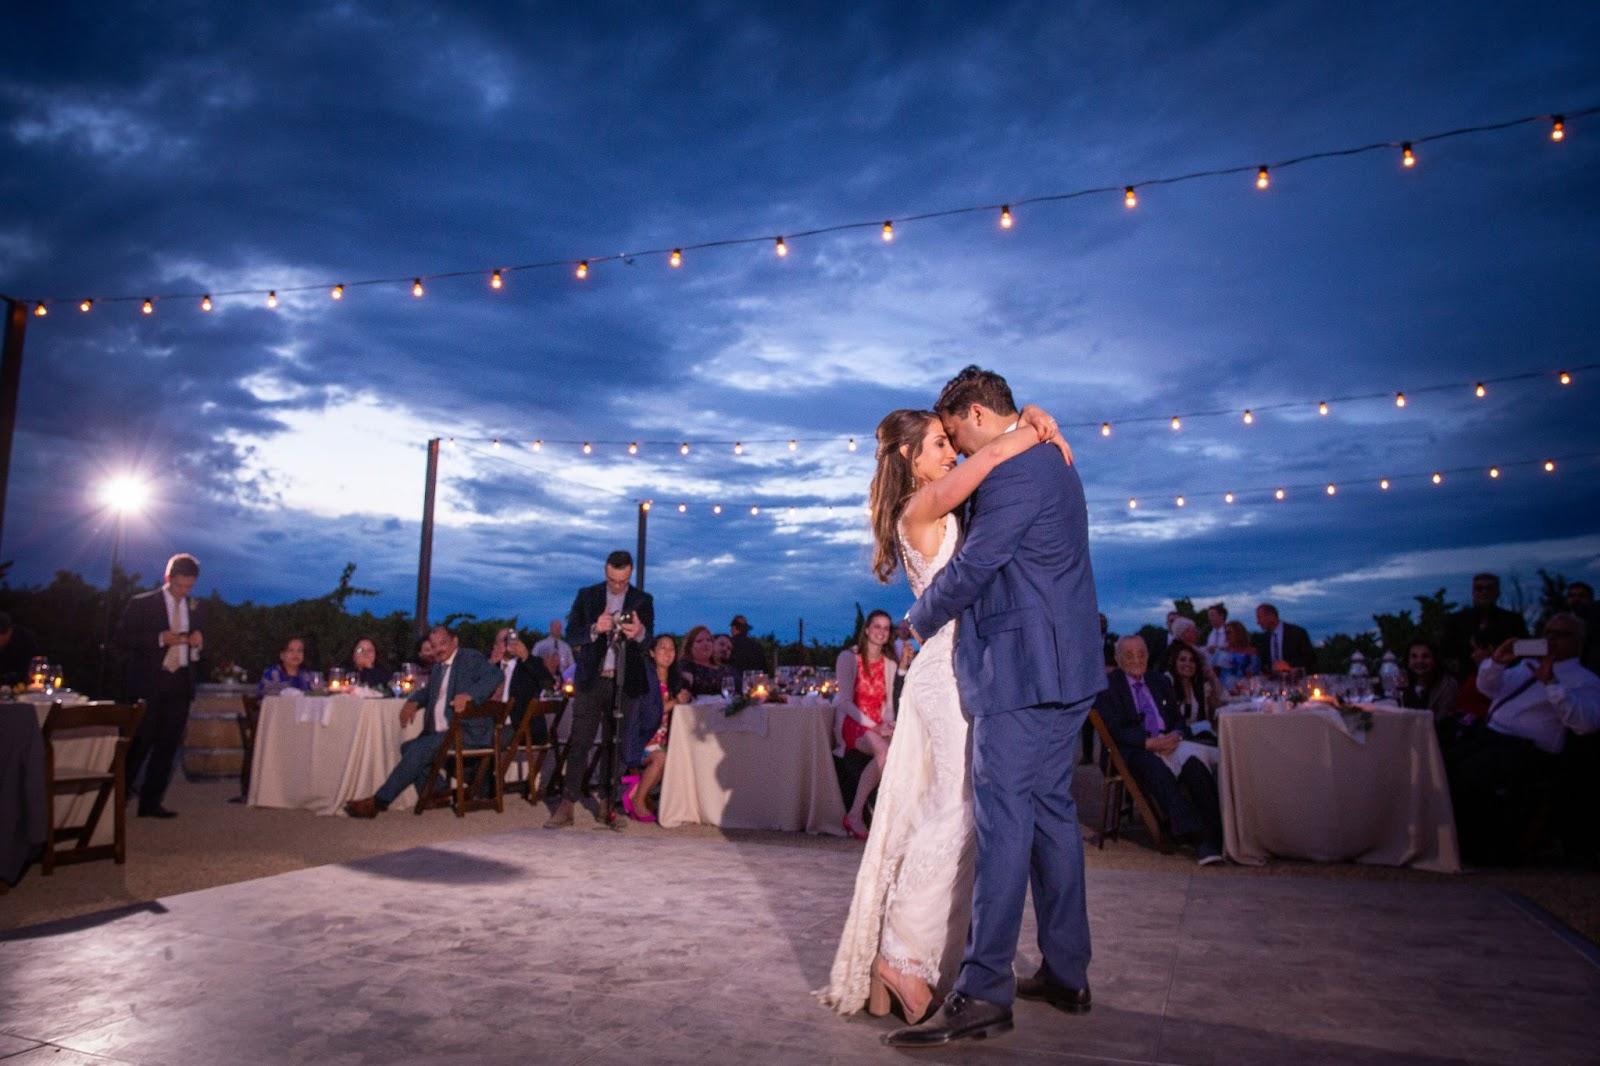 wedding venue dancefloor outside under string lights